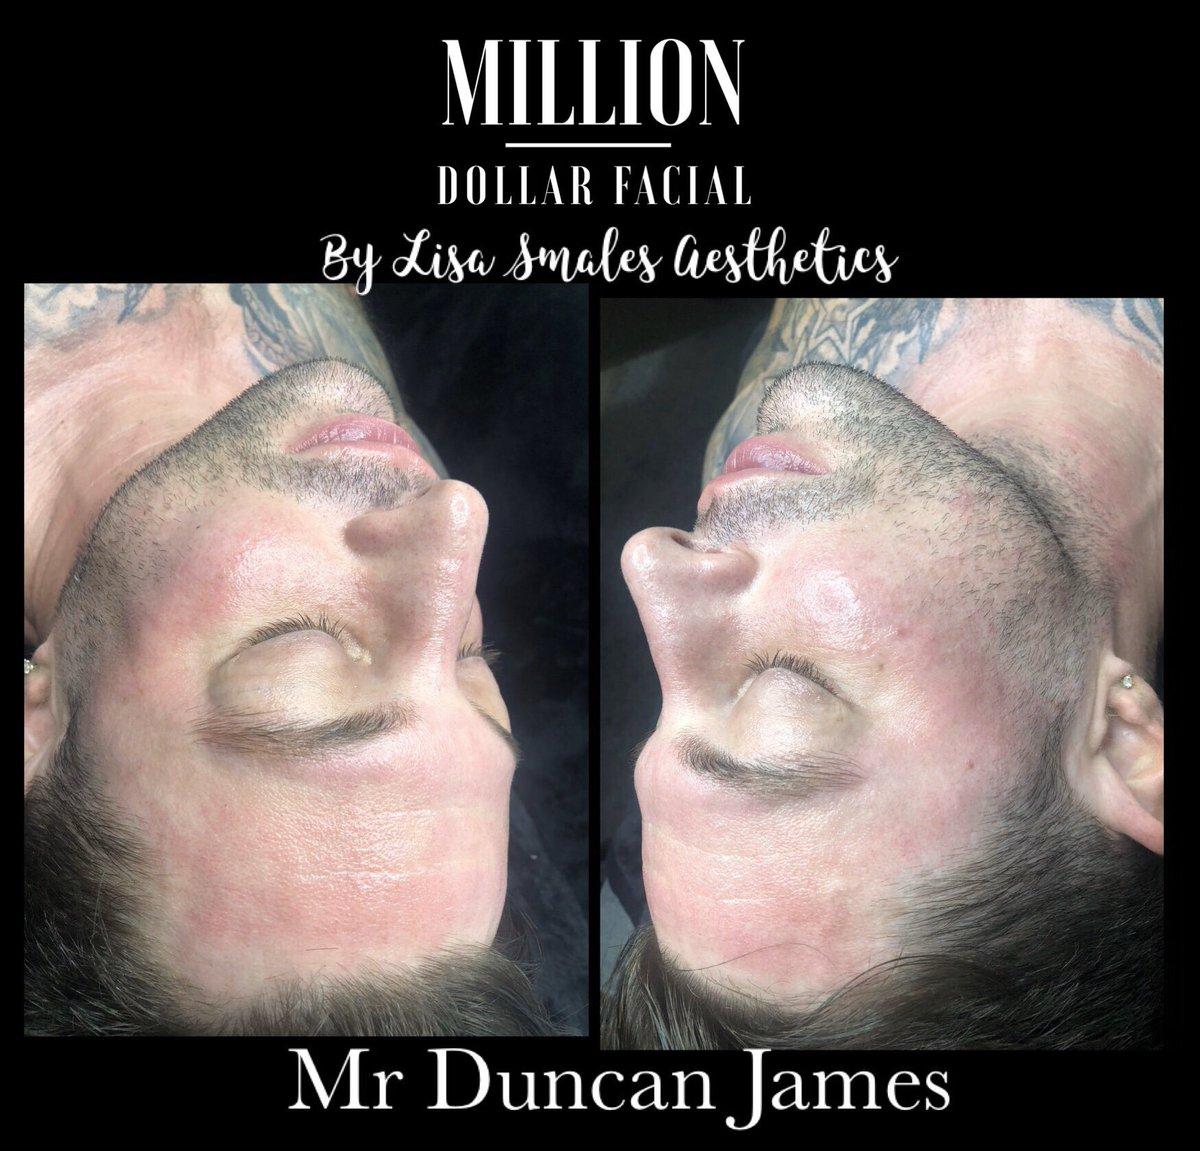 Don't feel Blue !! One Love #Blue #onelove #Duncanjames  #Milliondollarfacials #milliondollarfacial #Carbonpeel #miraclemask #dermaplane #dermaplaning #skincare #facial #beauty #hydrafacial #dermaplaningfacial #facials #microneedling #skinneedlng  #skintherapist #glowingskinpic.twitter.com/MdZOTks5sU